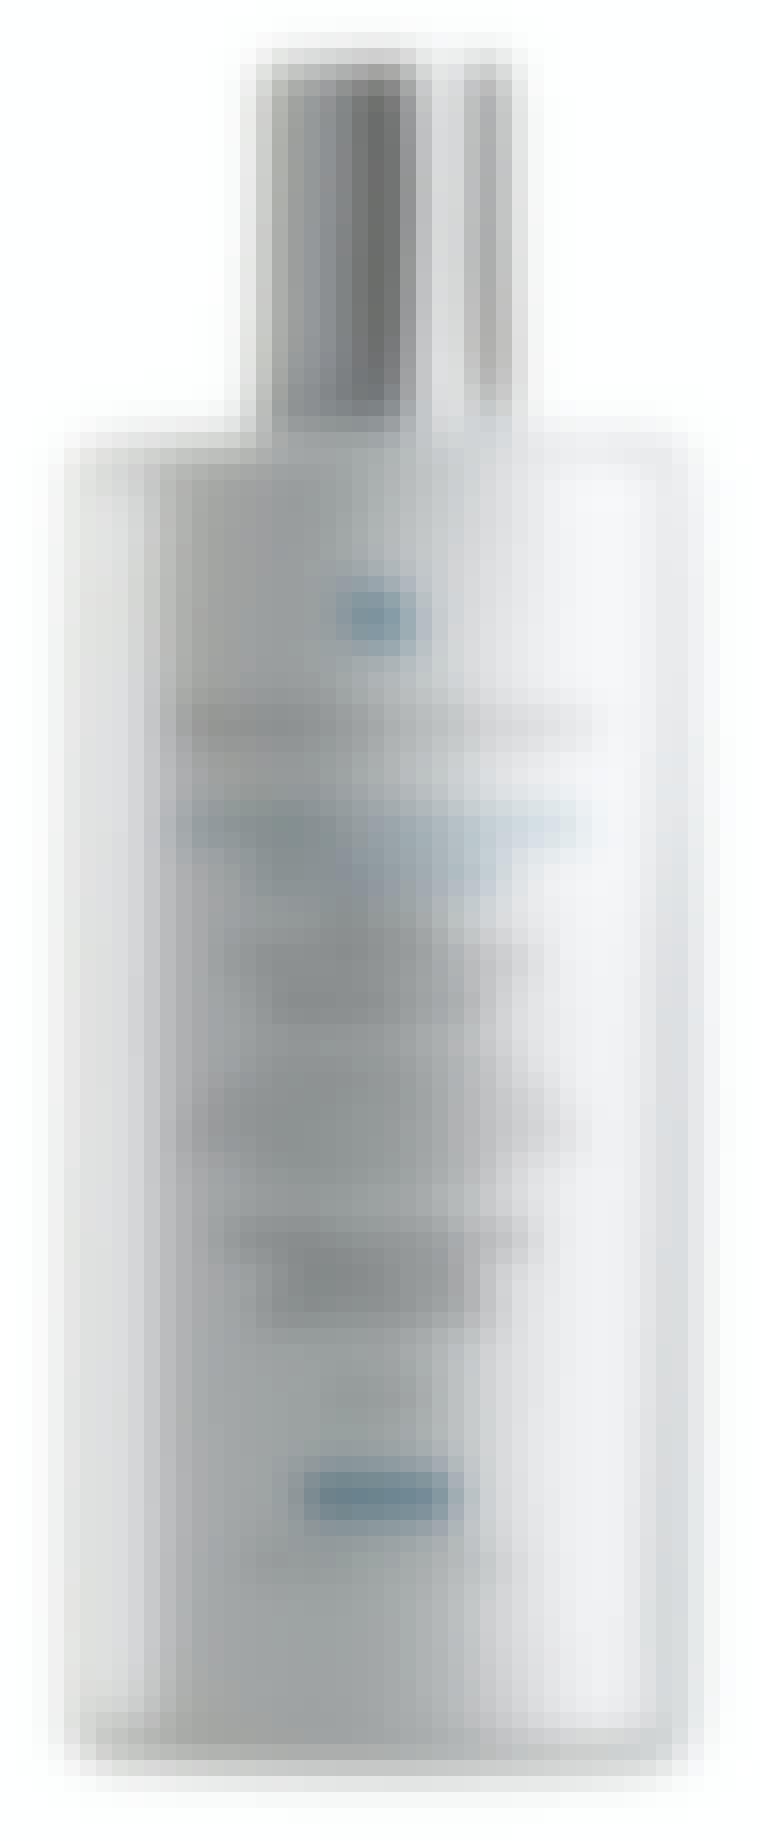 81145-SkinCeuticals-Mineral_Radiance_UV_Defense_SPF_50-440-NOK